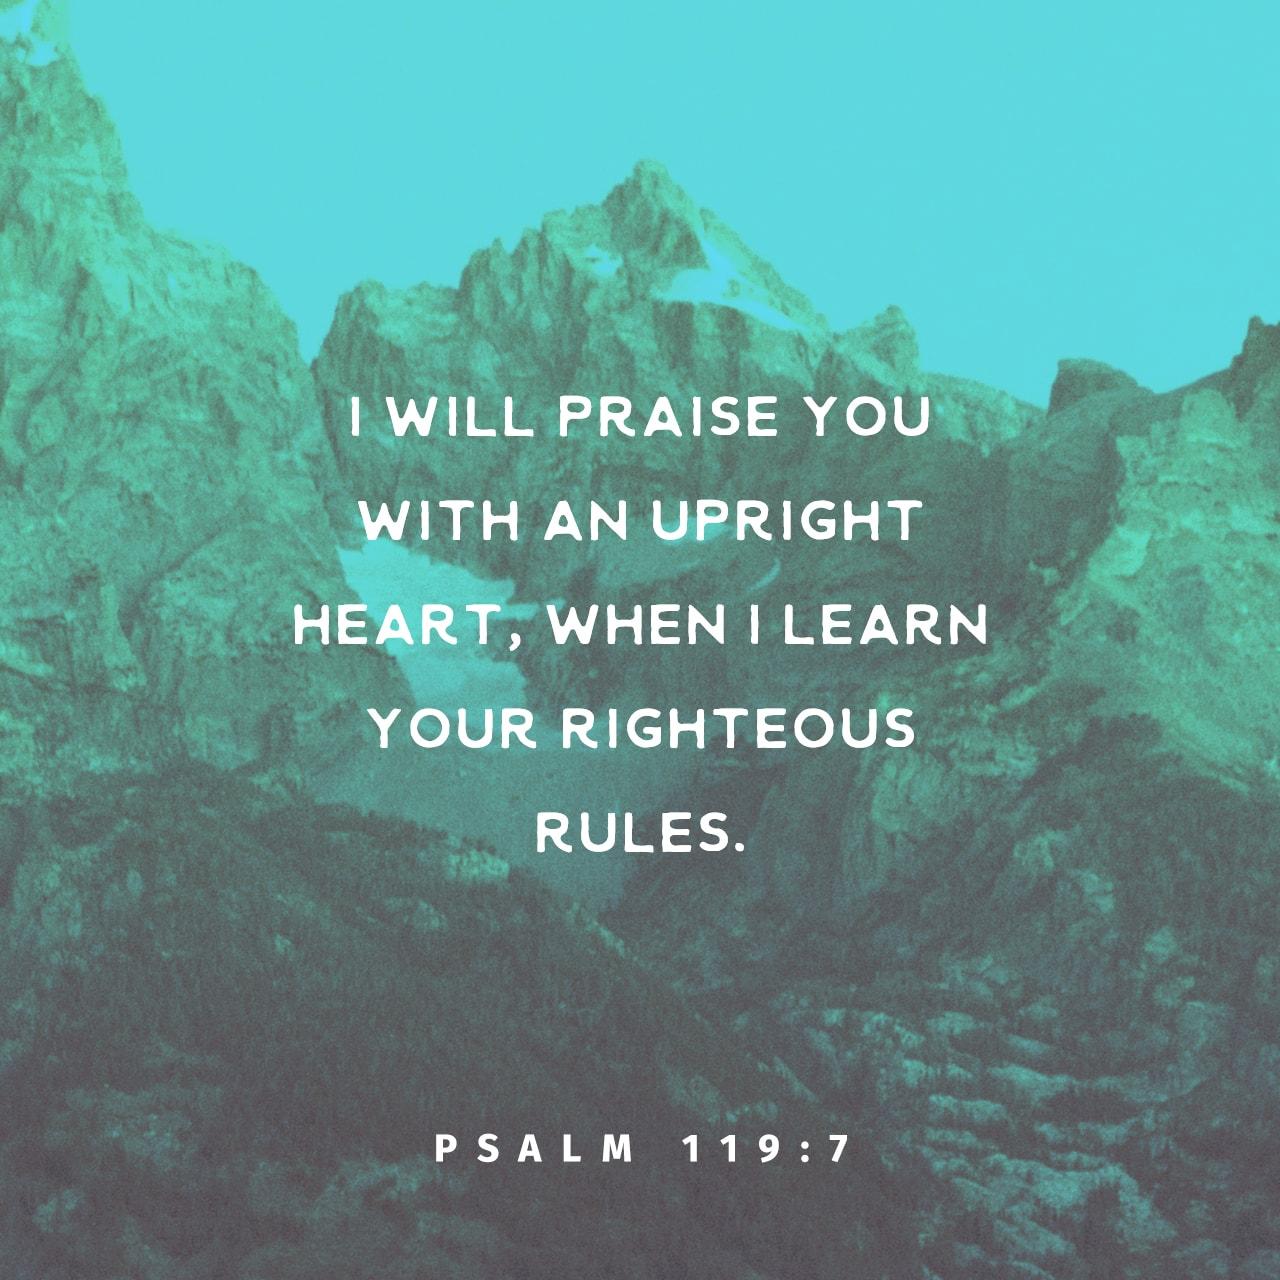 Psalm 119:7